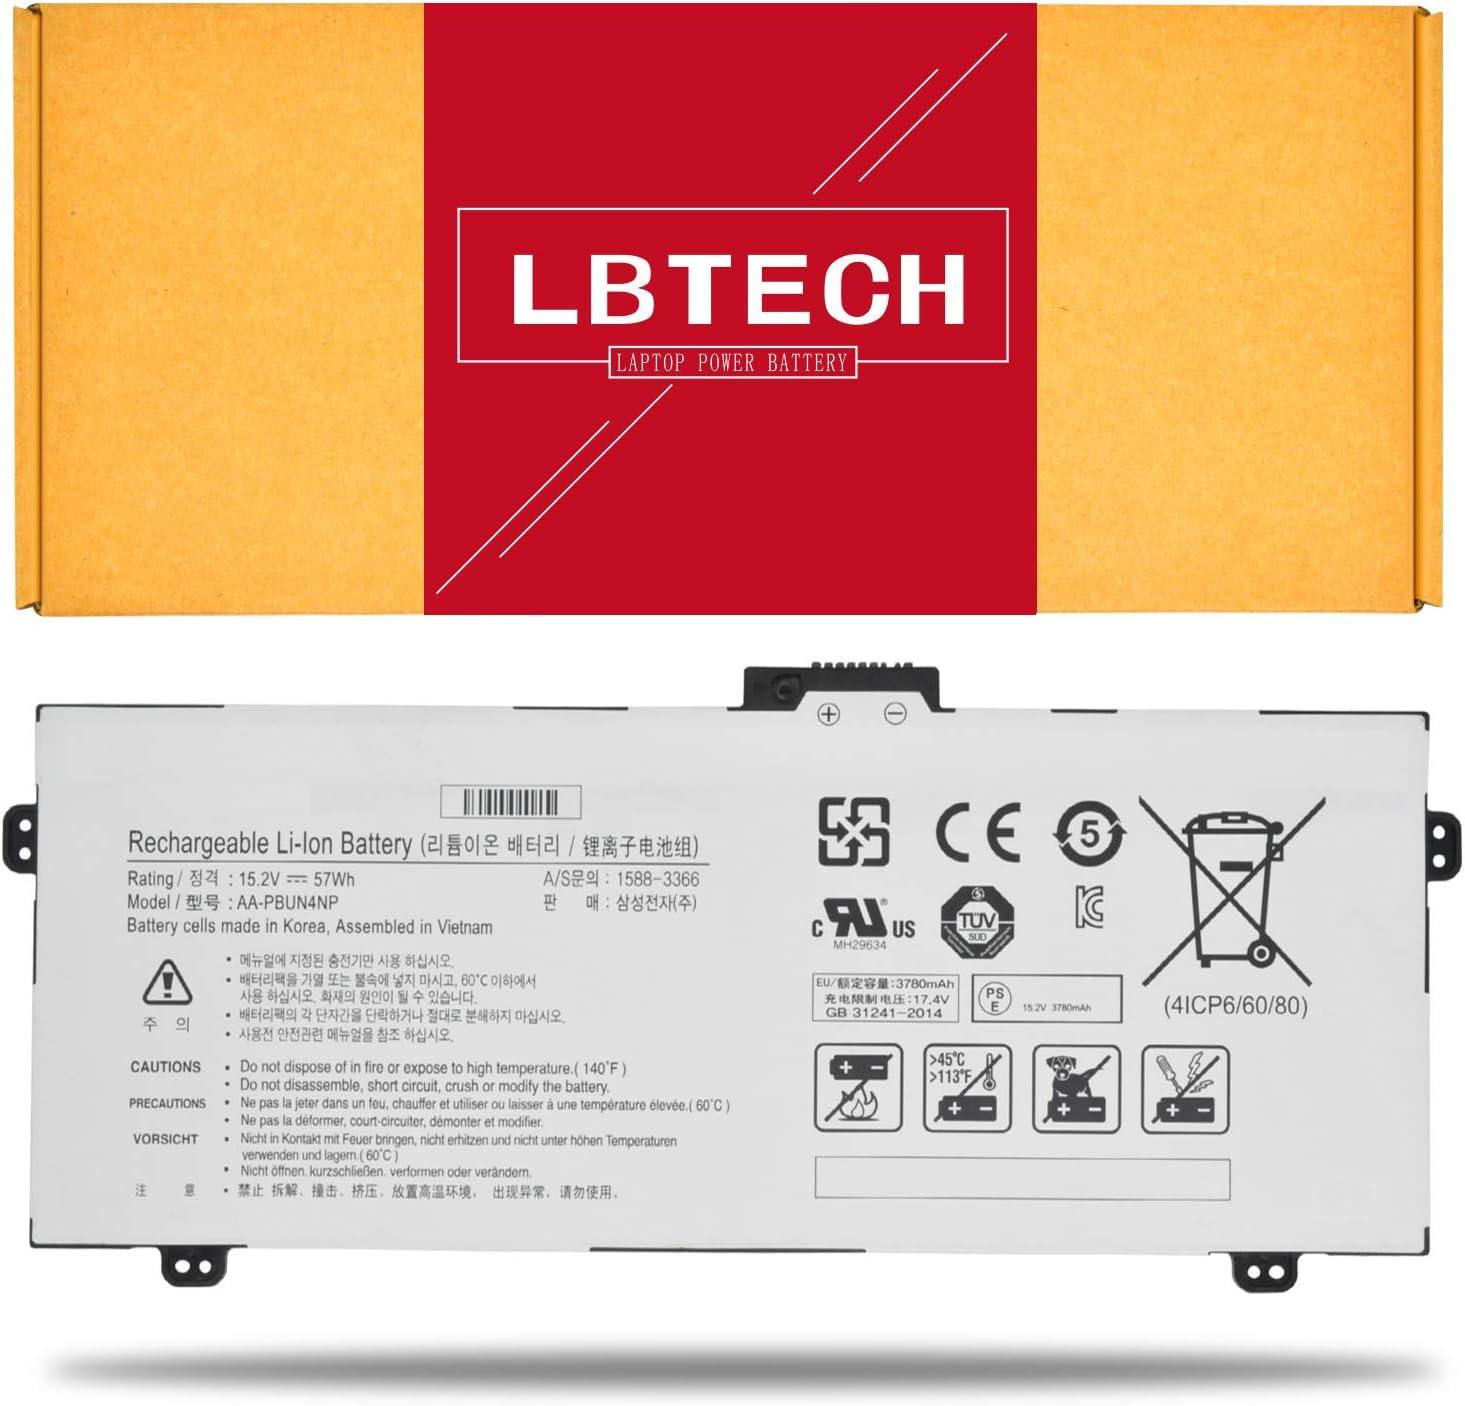 LBTECH AA-PBUN4NP Compatible Laptop Battery Replacement for Samsung NP940Z5L NP940Z5L-X01US Series BA43-00374A 4ICP6/60/80 15.2V 57Wh